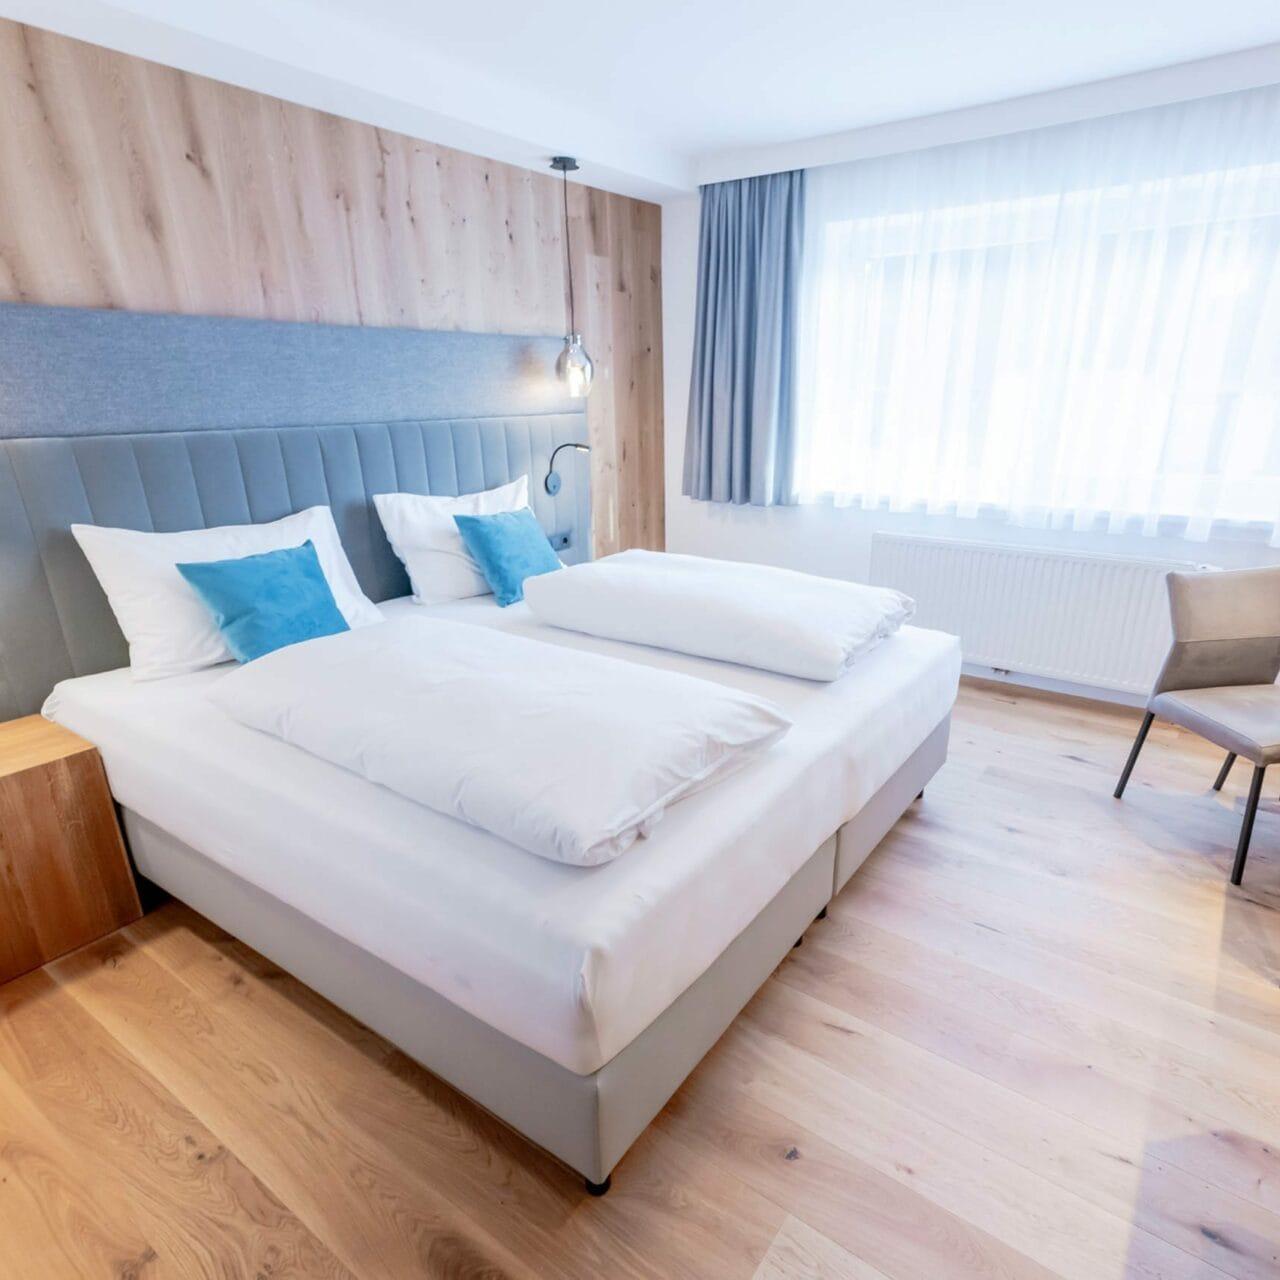 04-hofgut-apartment-lifestyle-resort-wagrain-salzburg-apartments-05